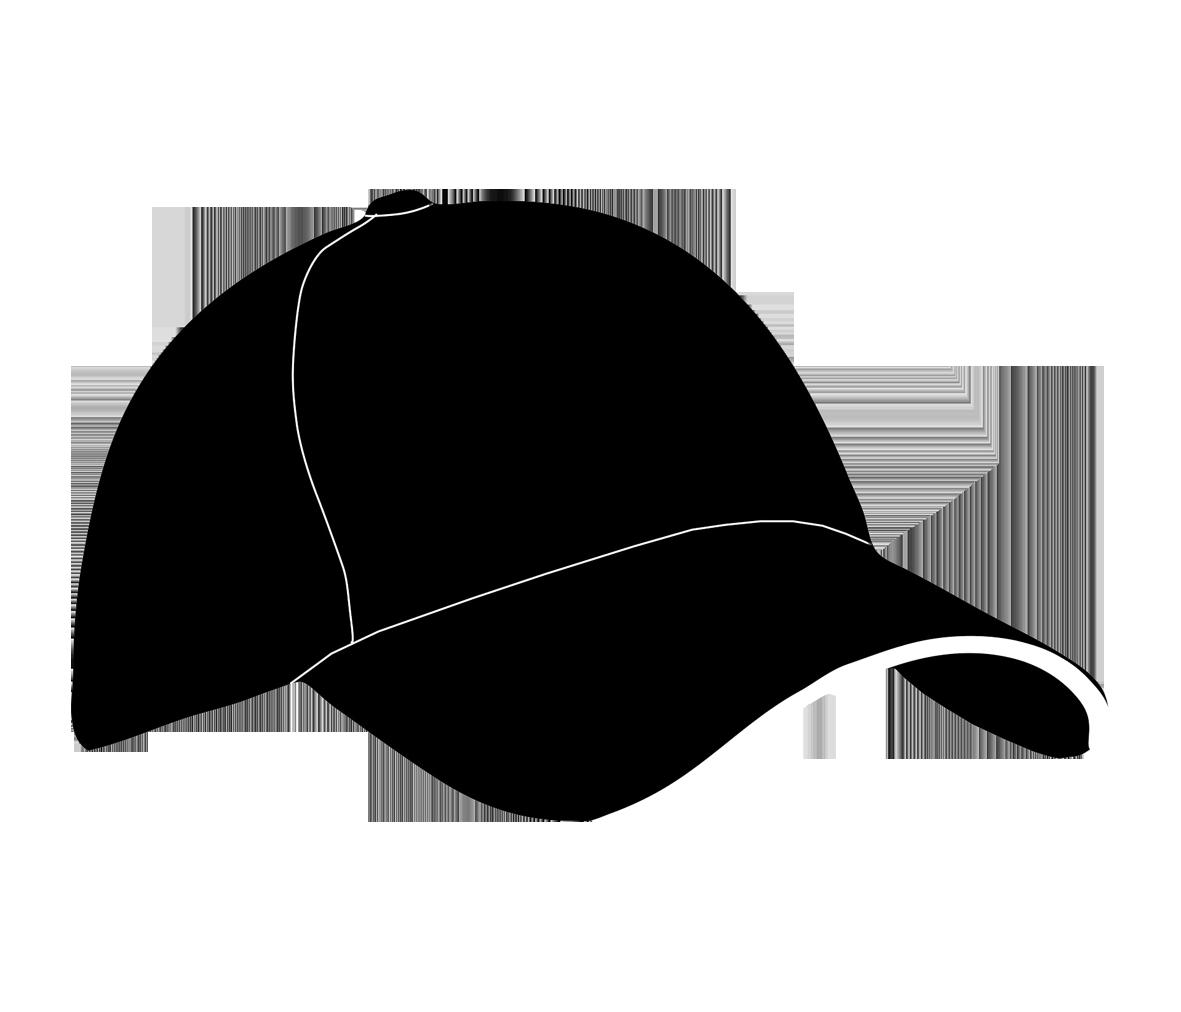 Clipart hat transparent background. Baseball